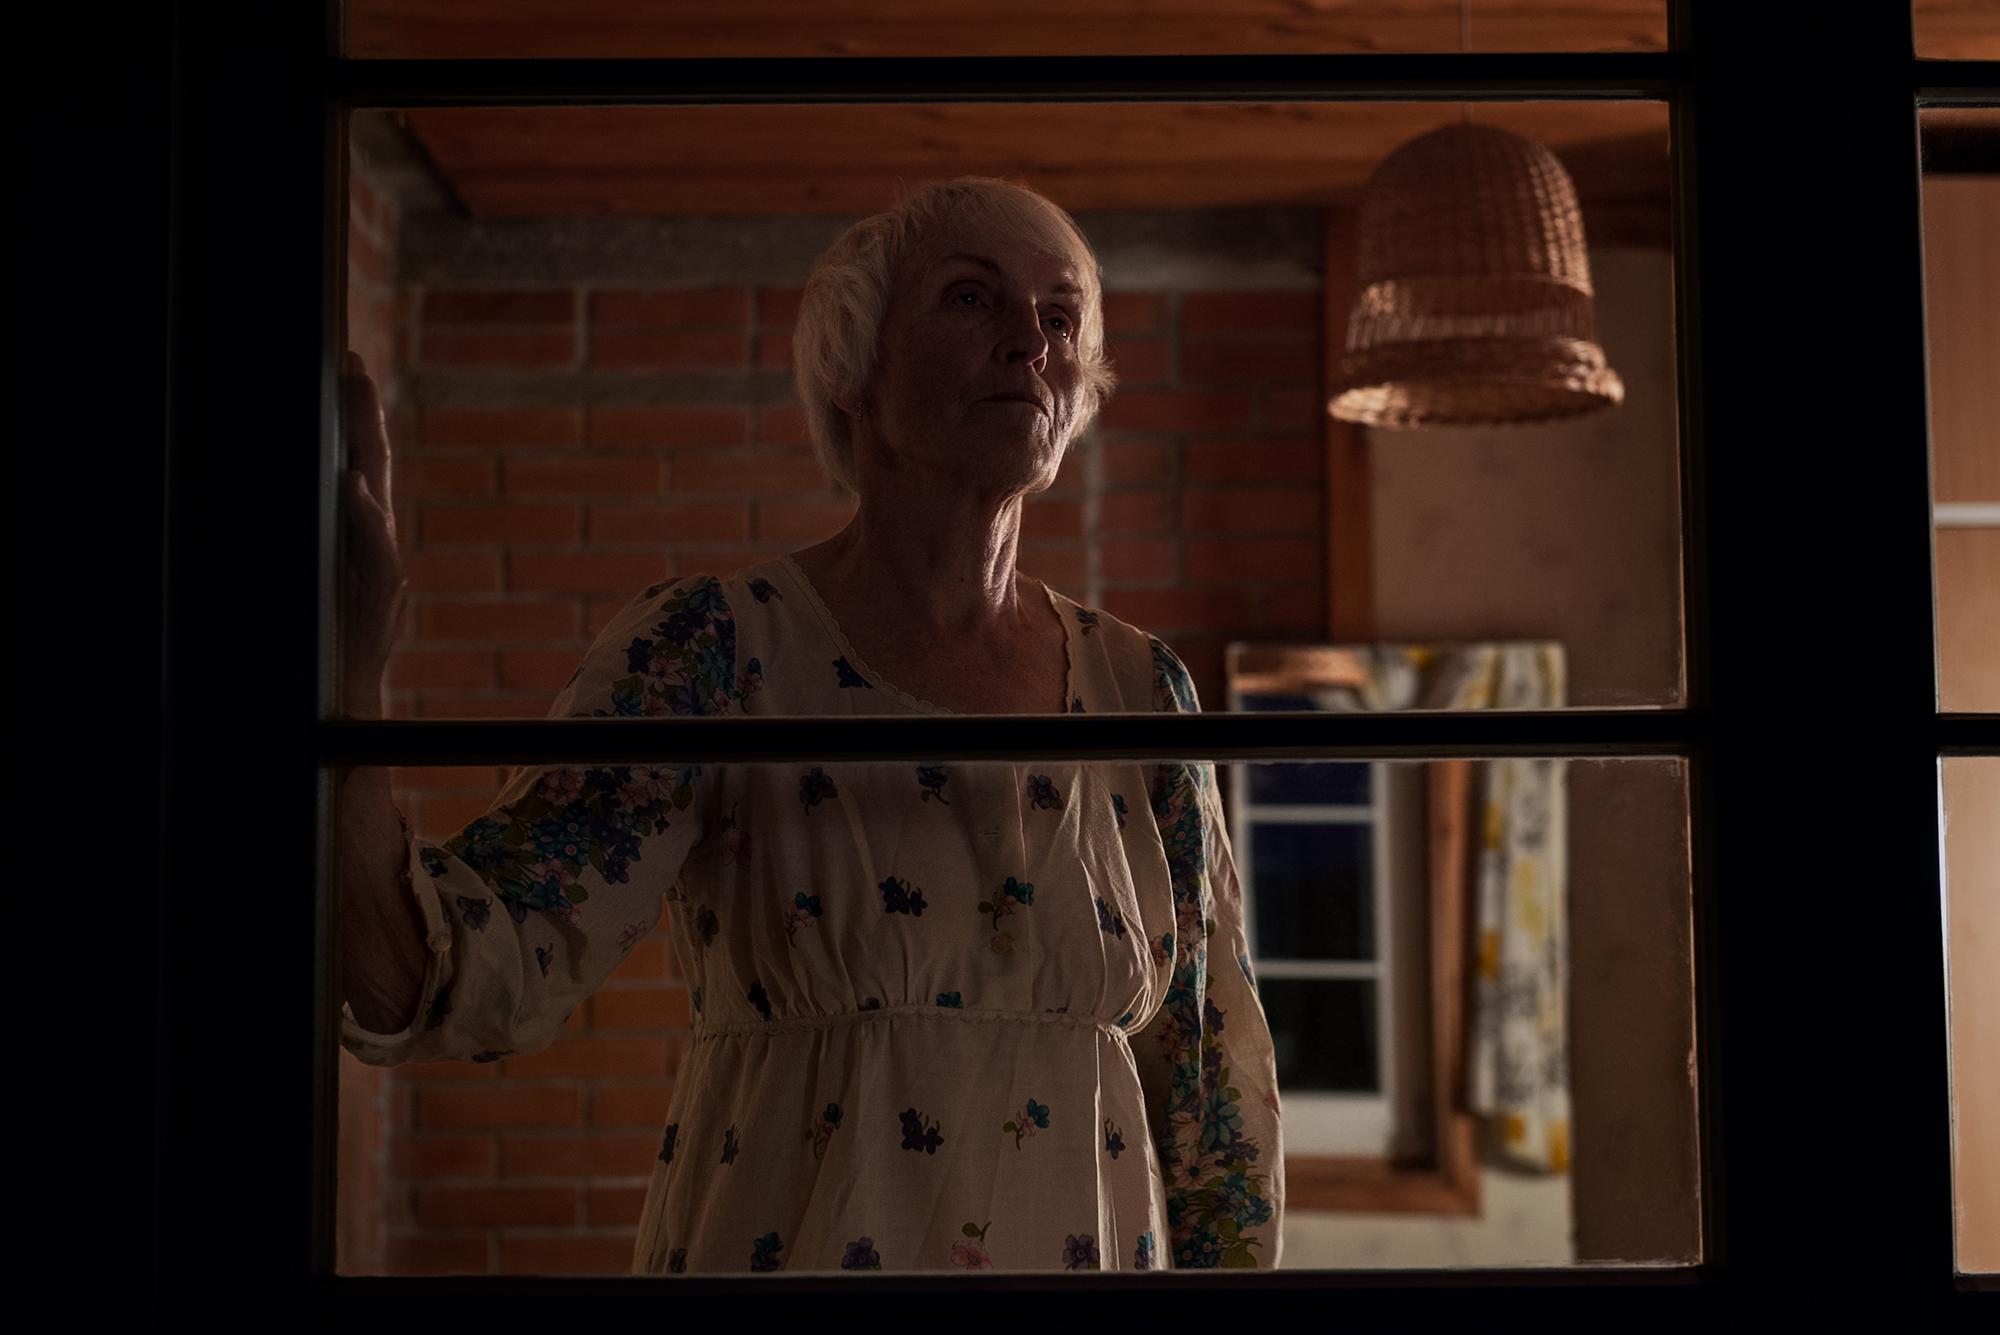 Grandma at the Window